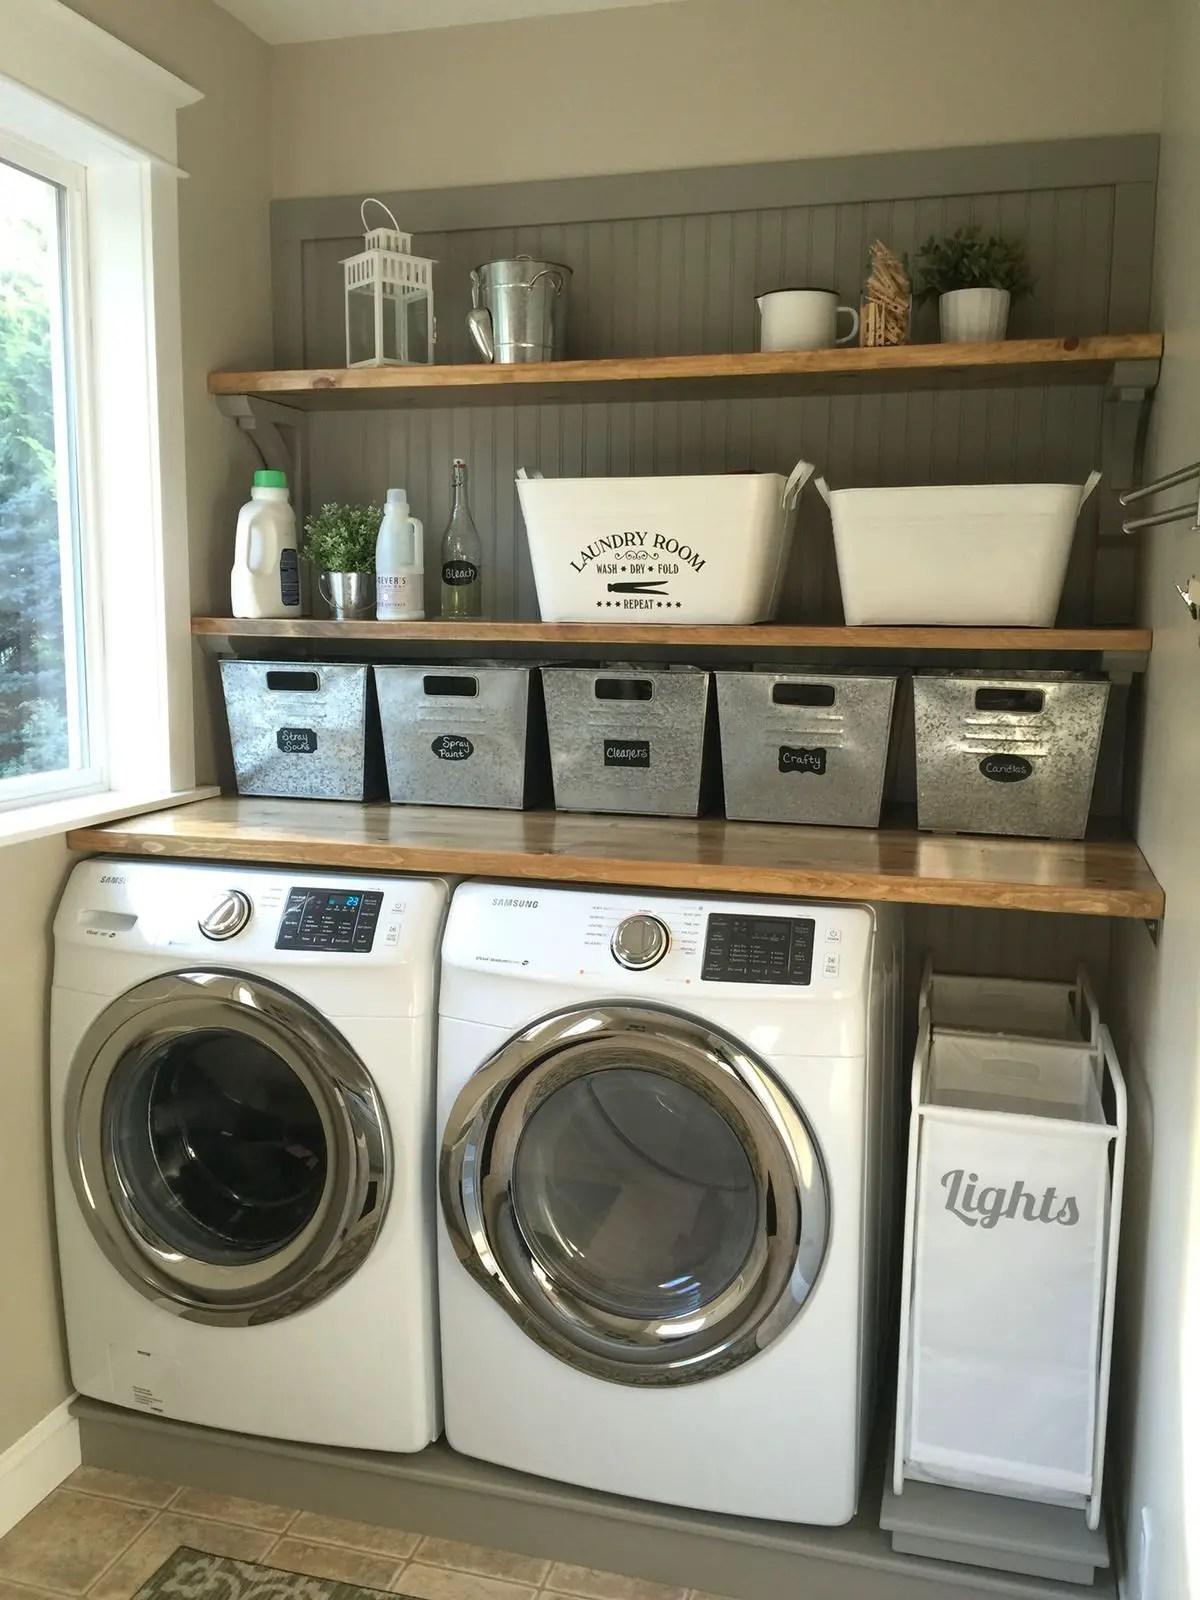 23 Small Laundry Room Storage Ideas - decoratoo on Small Laundry Ideas  id=25606